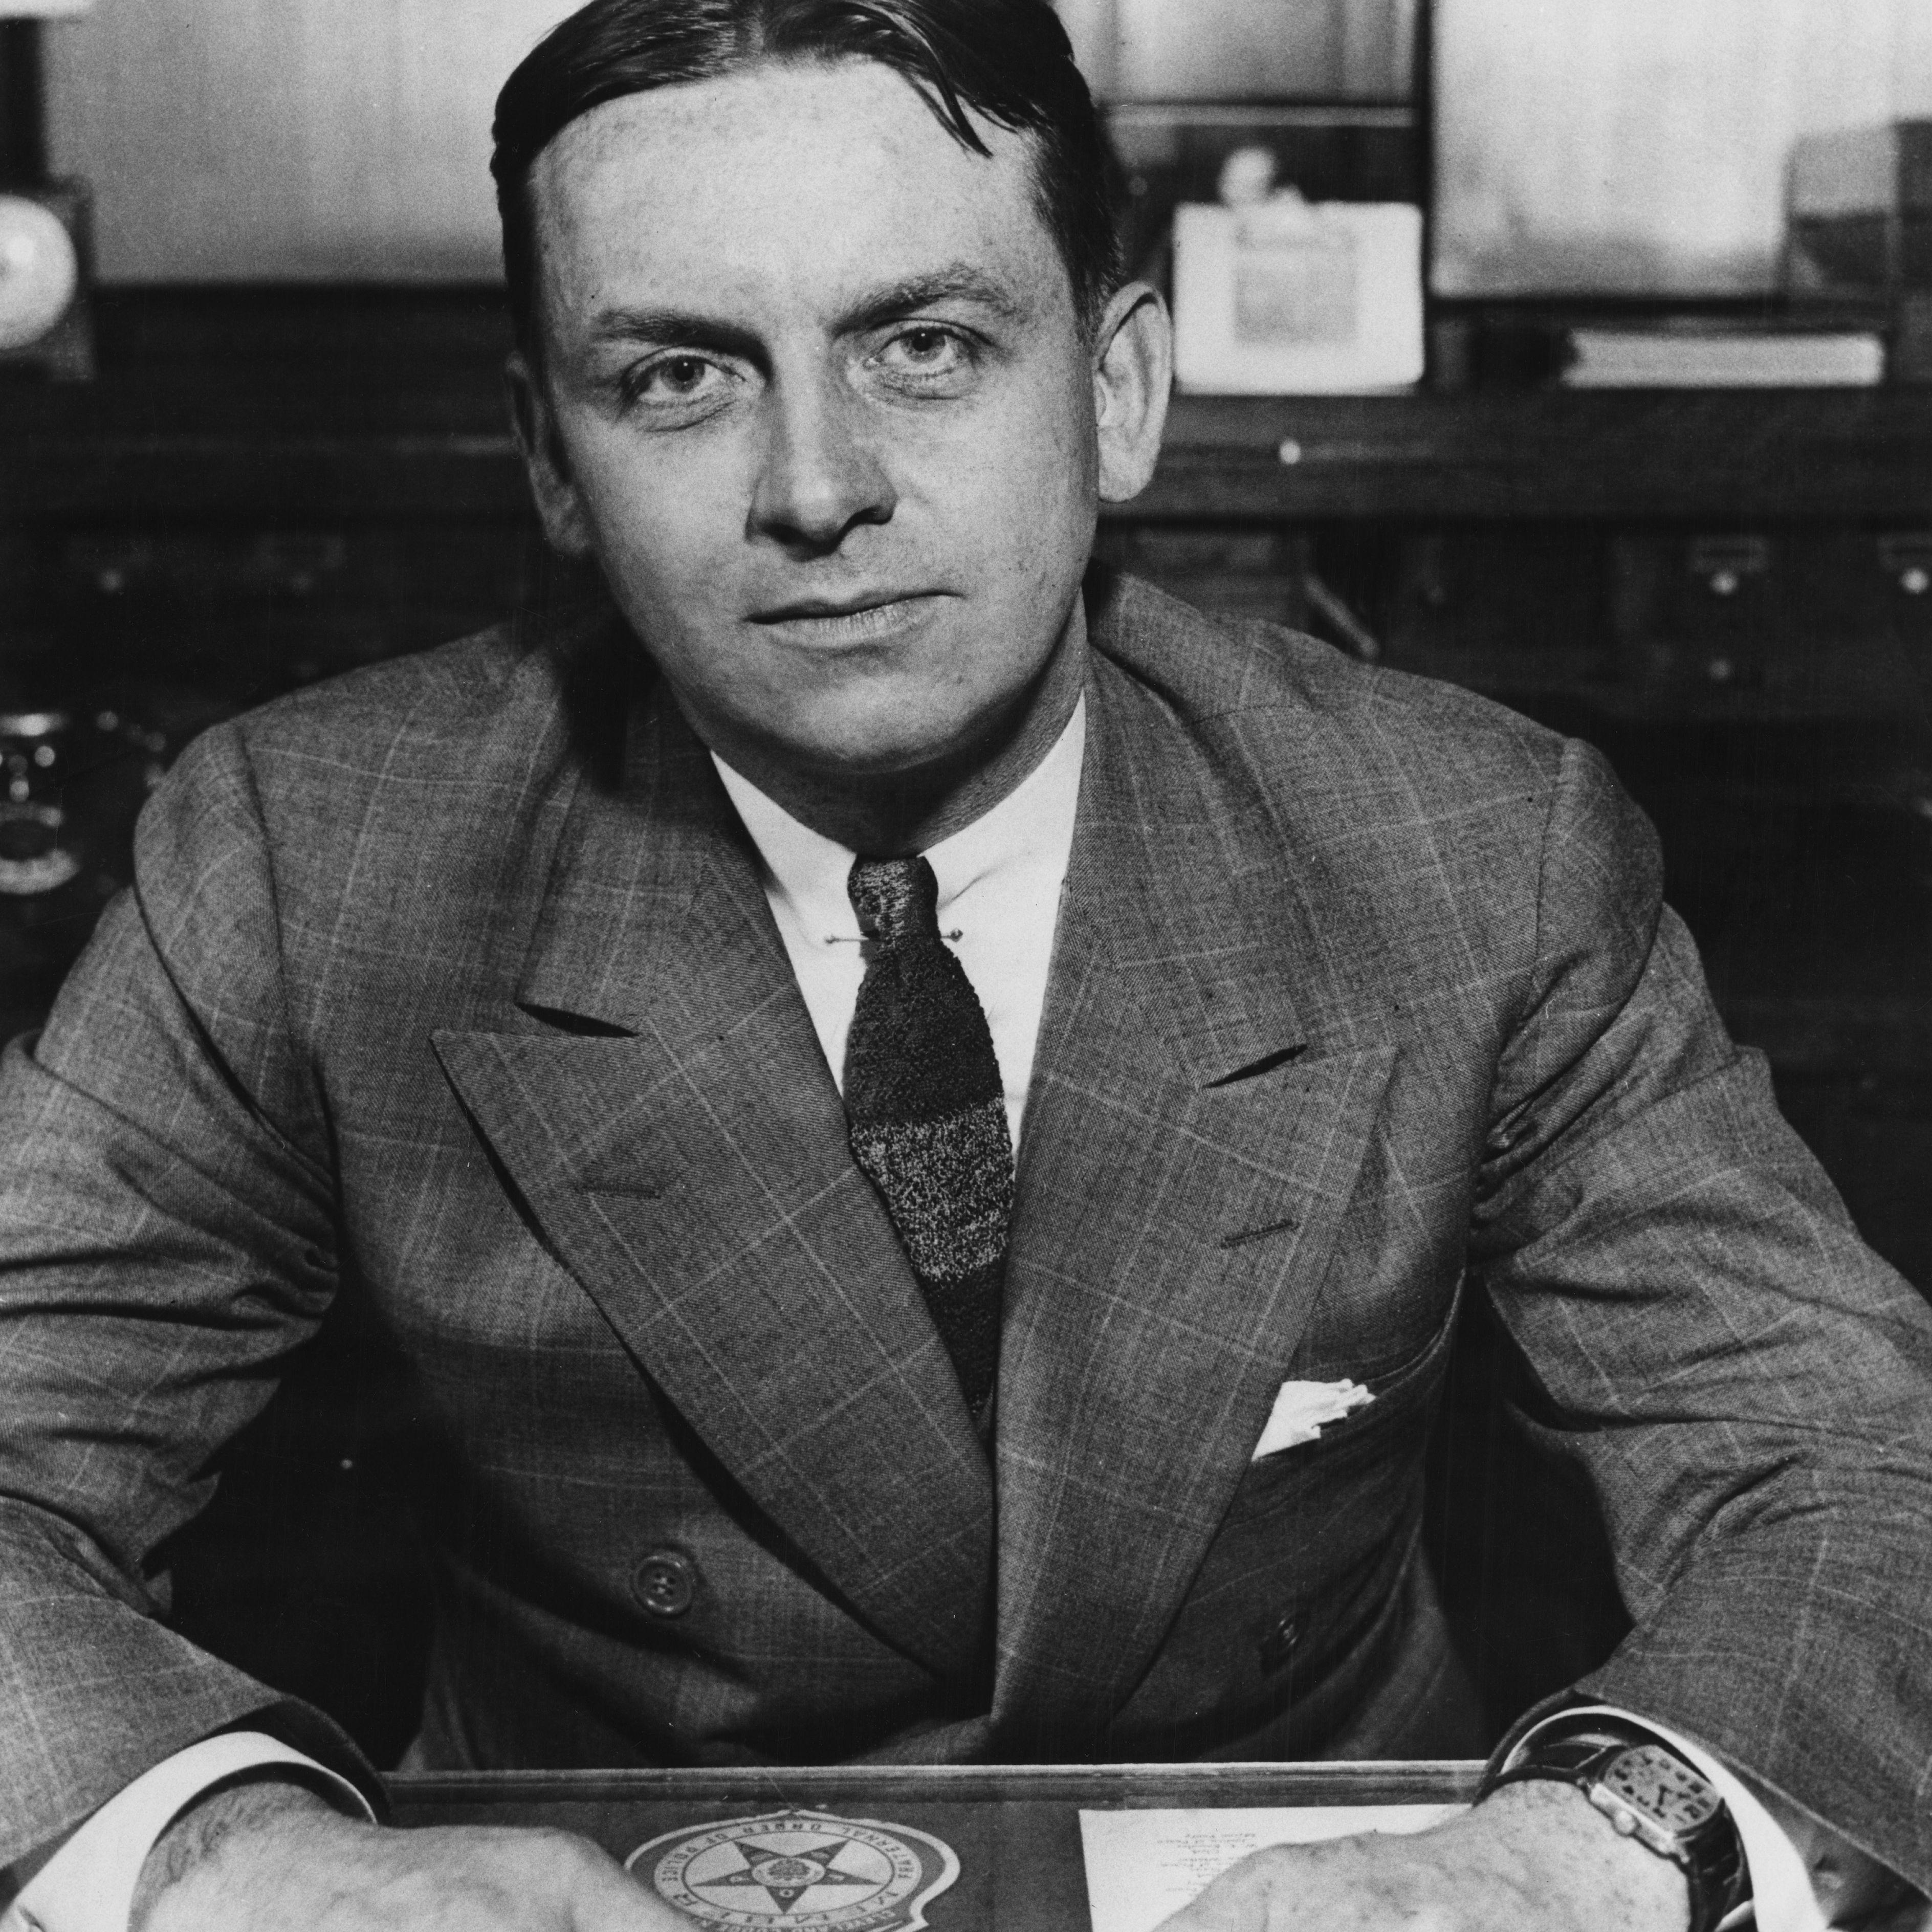 FBI Agent Eliot Ness Seated At Desk, c. 1930.